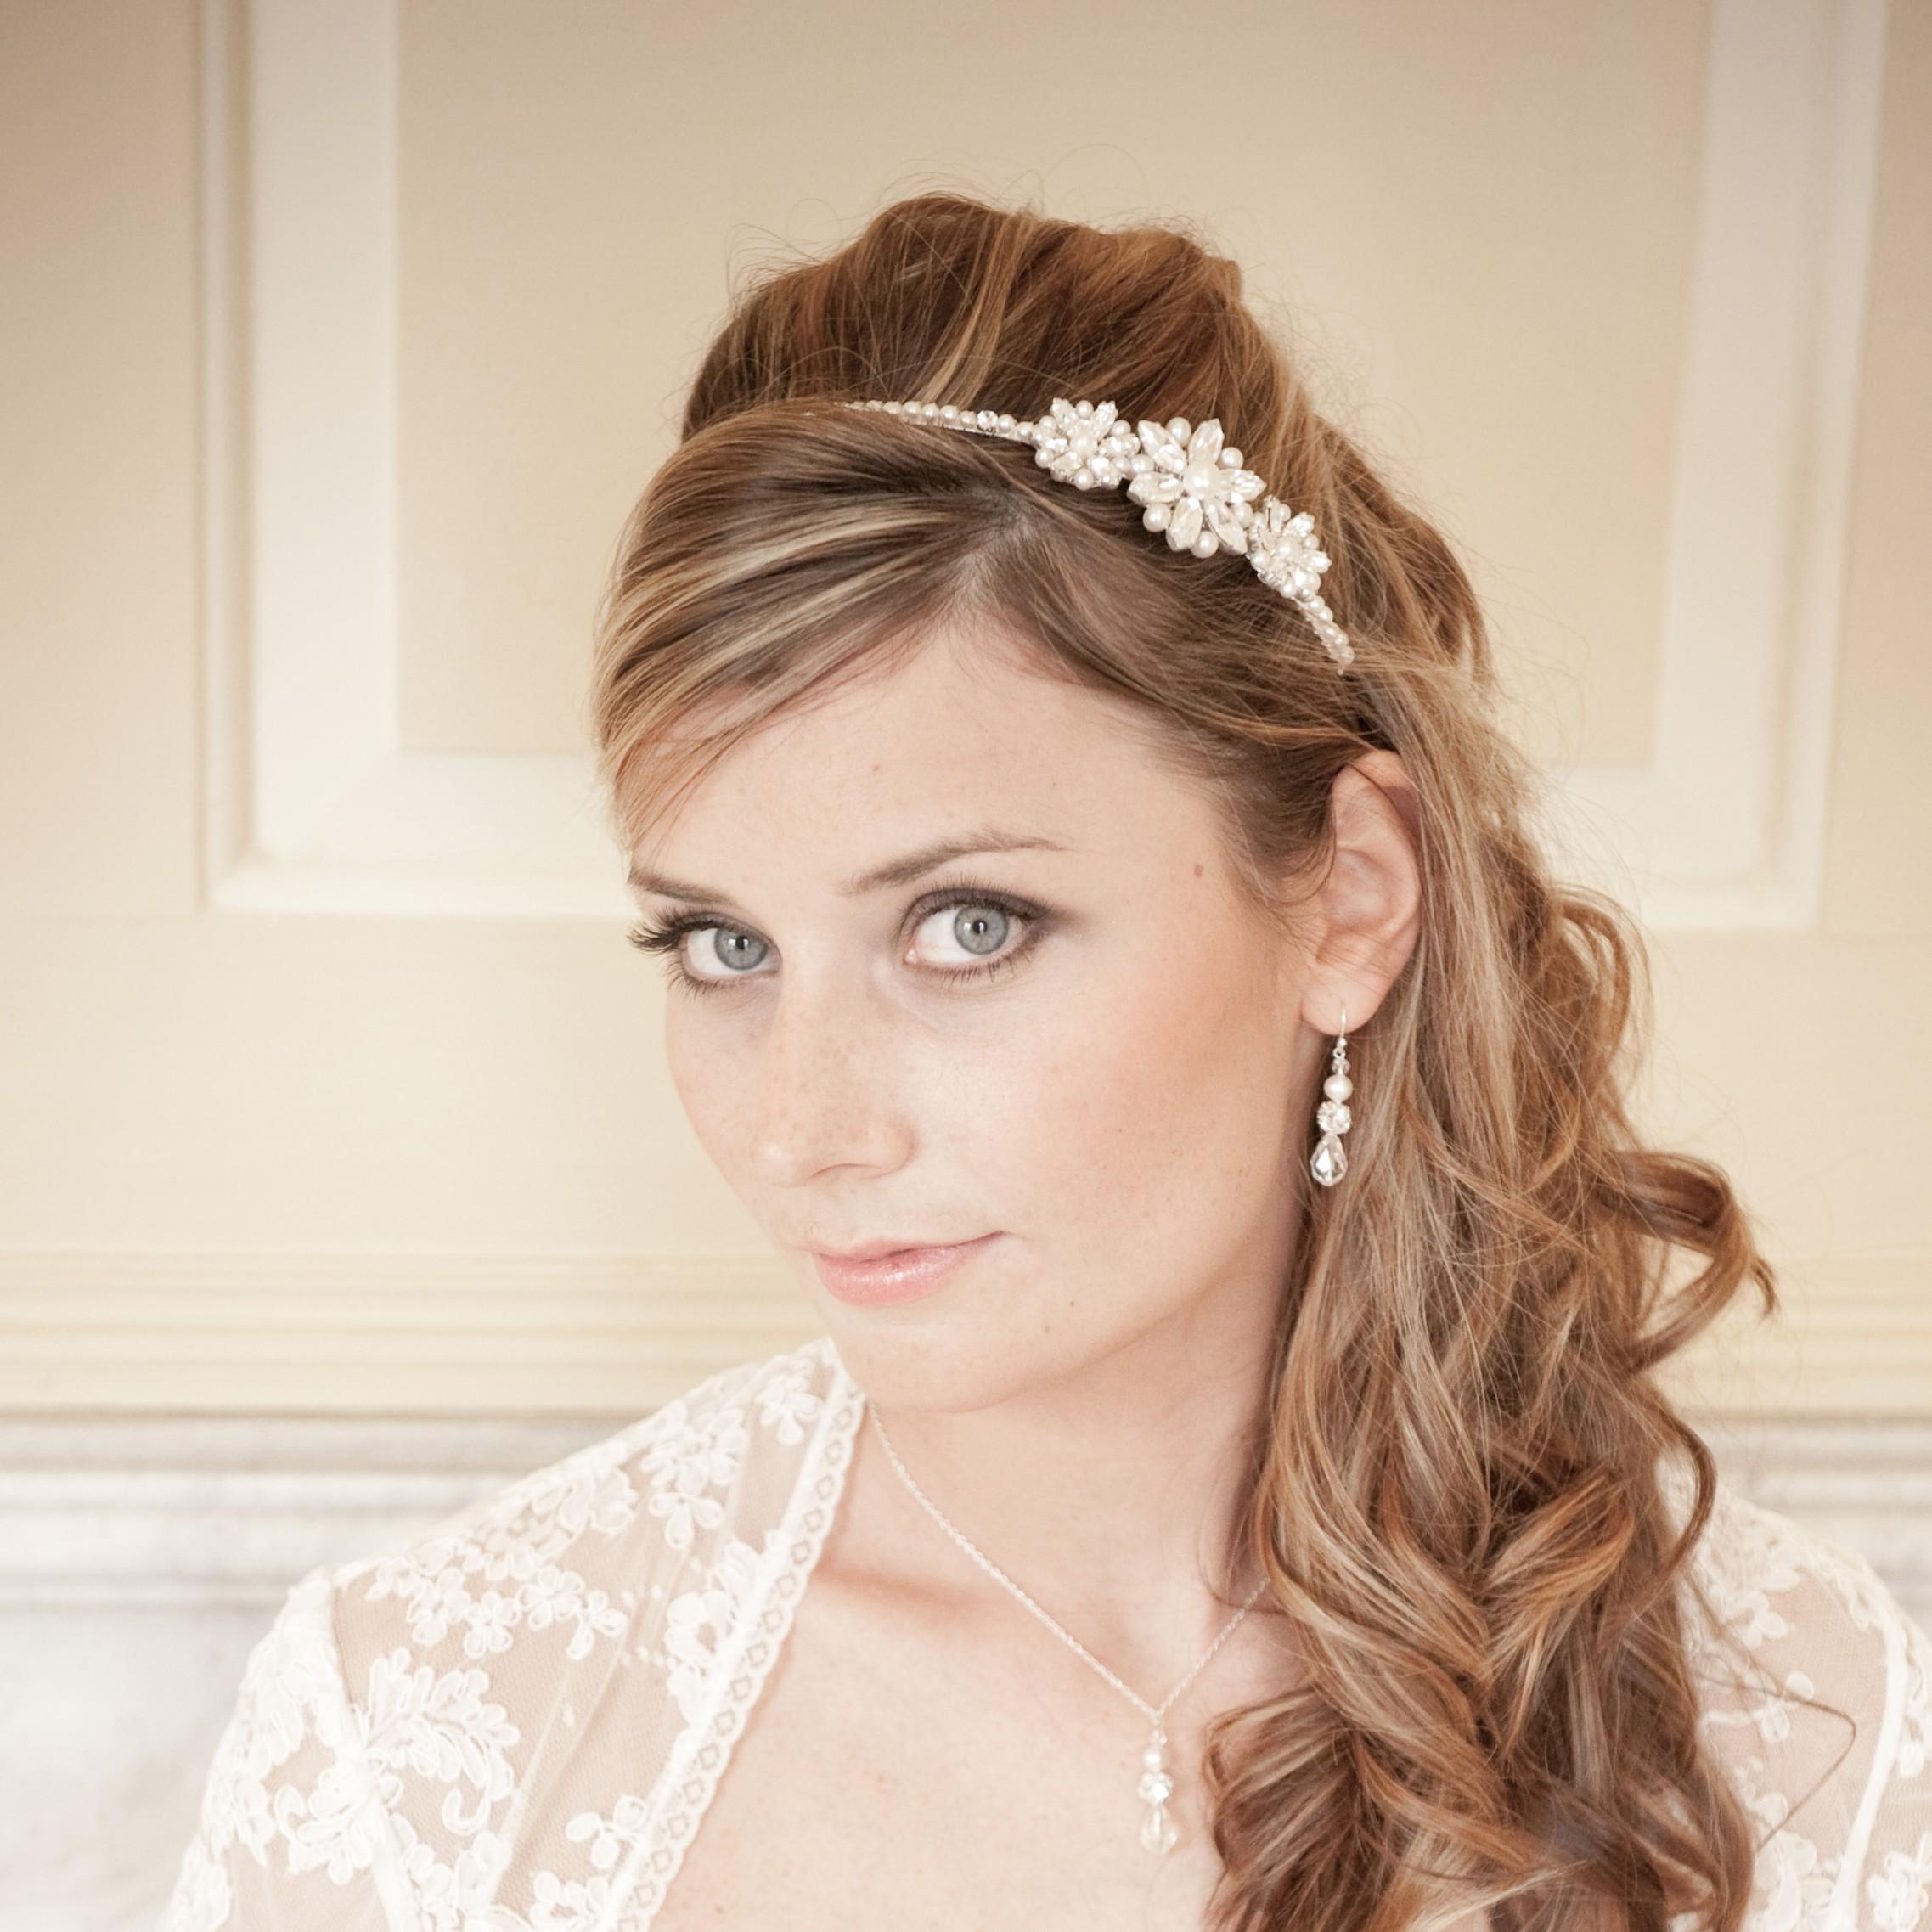 Vanessa II Vintage Pearl Bridal Headband f4babf190a1